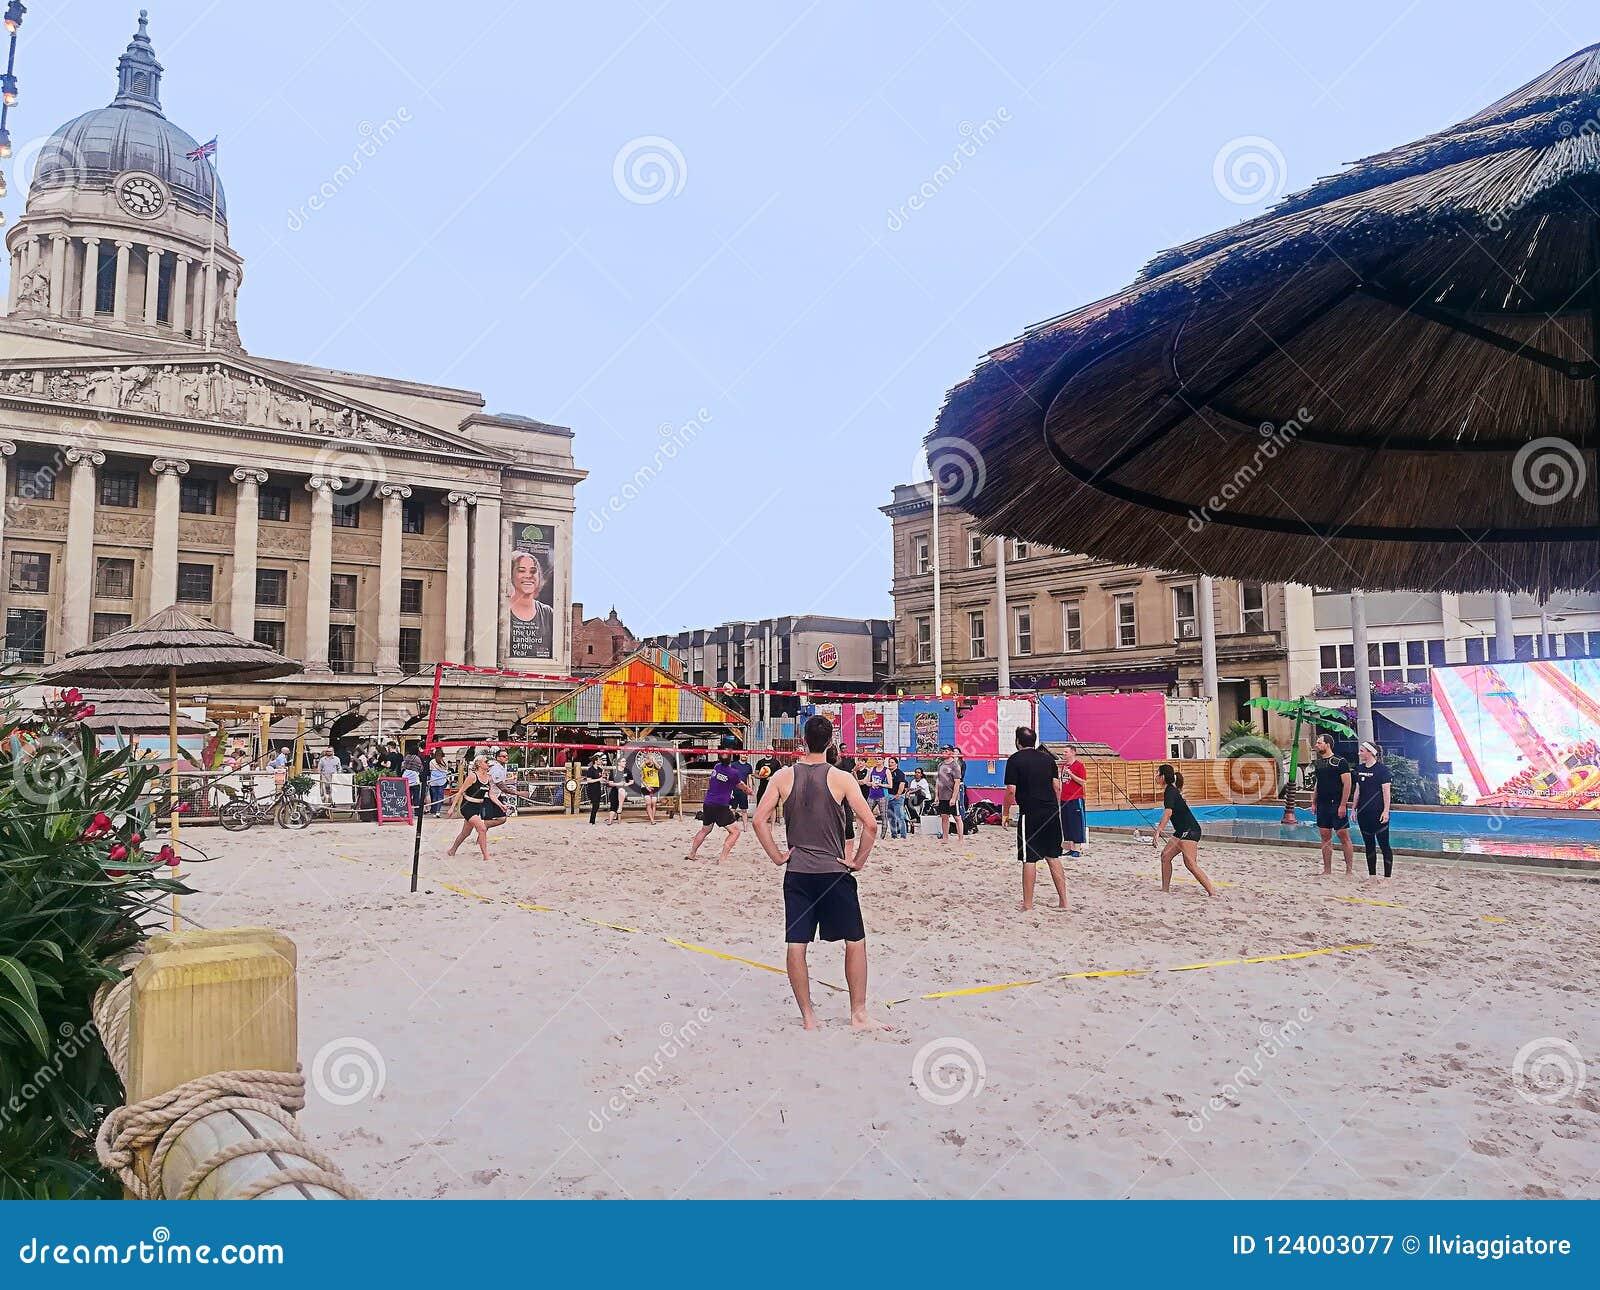 Inglaterra, voleibol de praia perto da câmara municipal de Nottingham